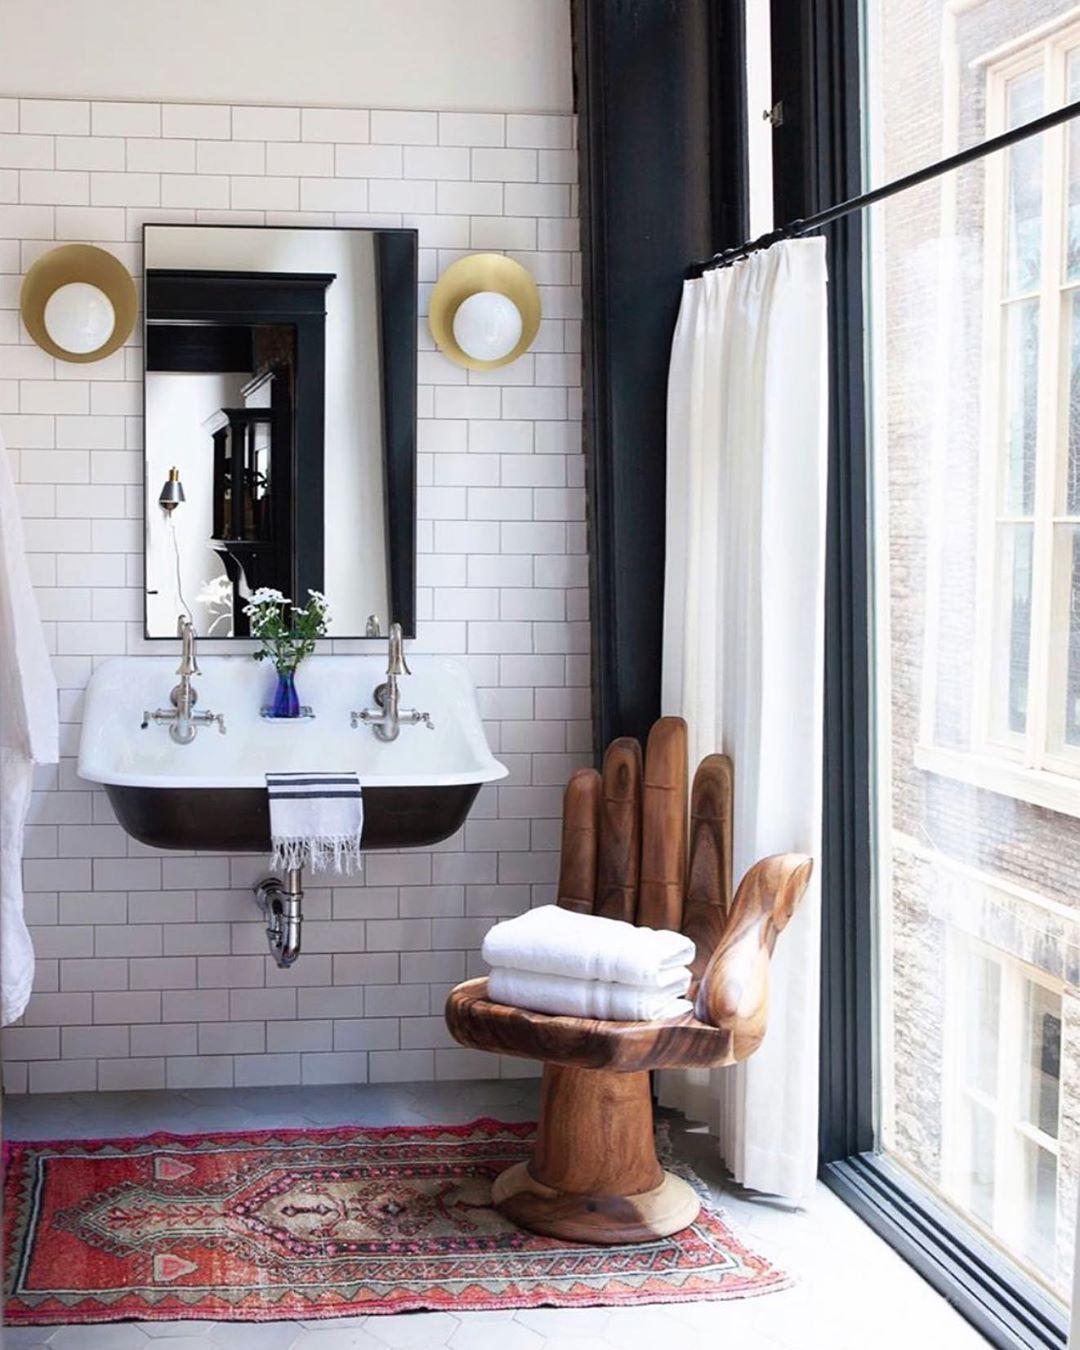 100 bathroom inspiration cedar moss ideas in 2020 cedar and moss bathroom inspiration wood canopy 100 bathroom inspiration cedar